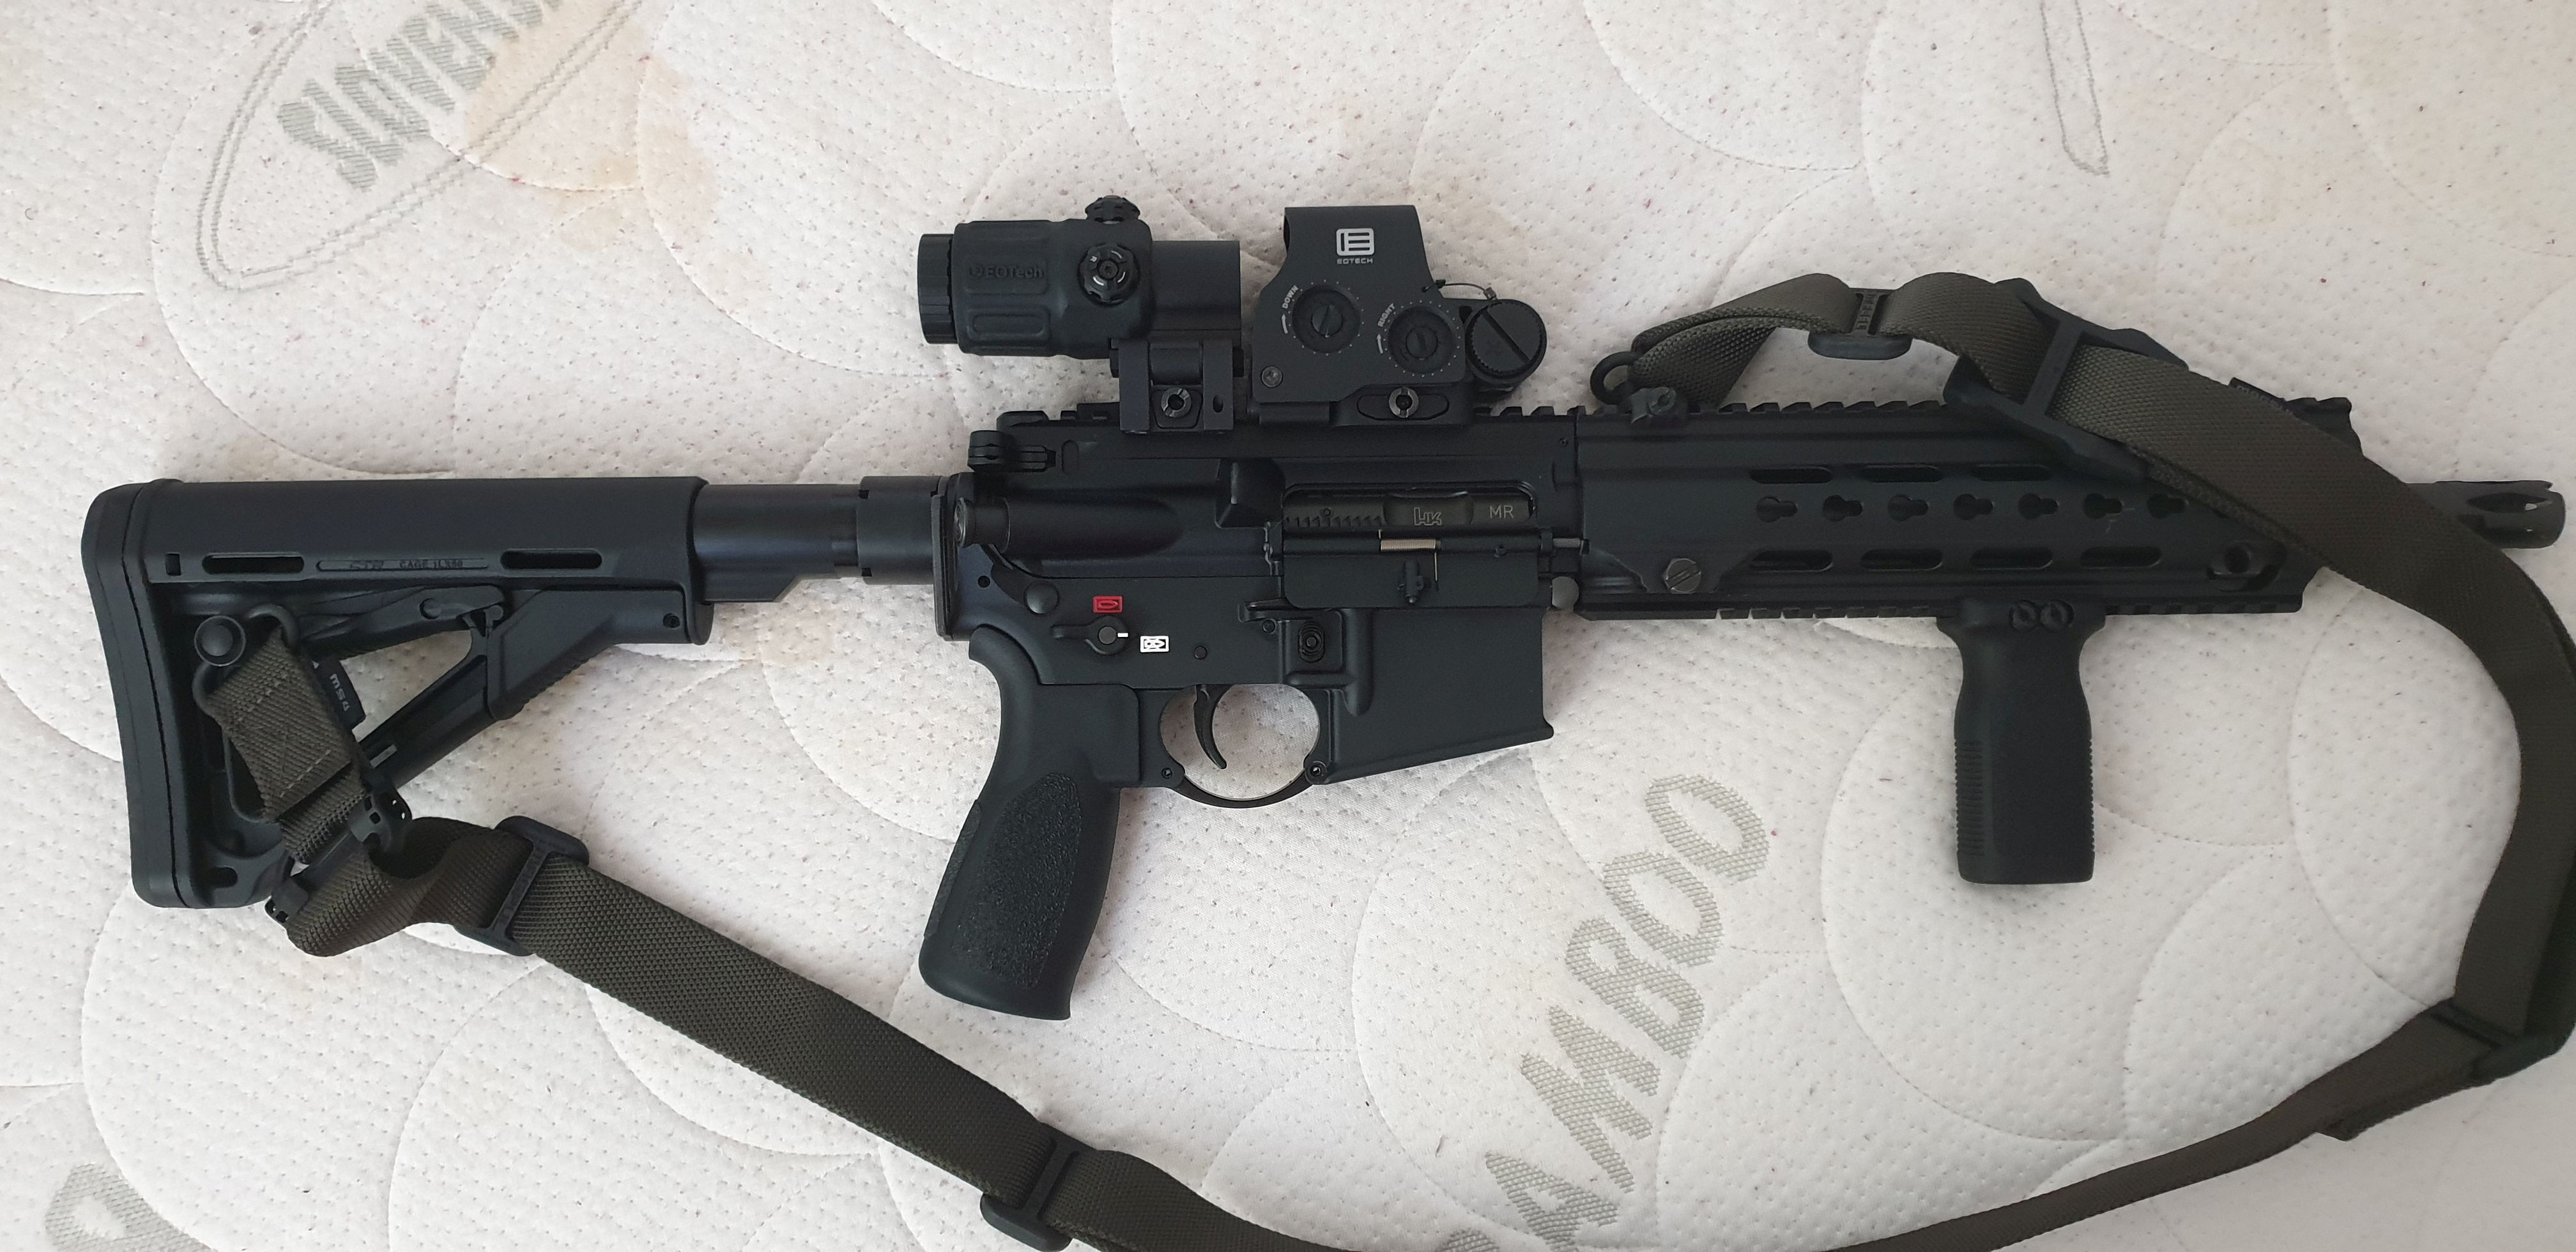 HK MR223 Sling-20190824_150308.jpg